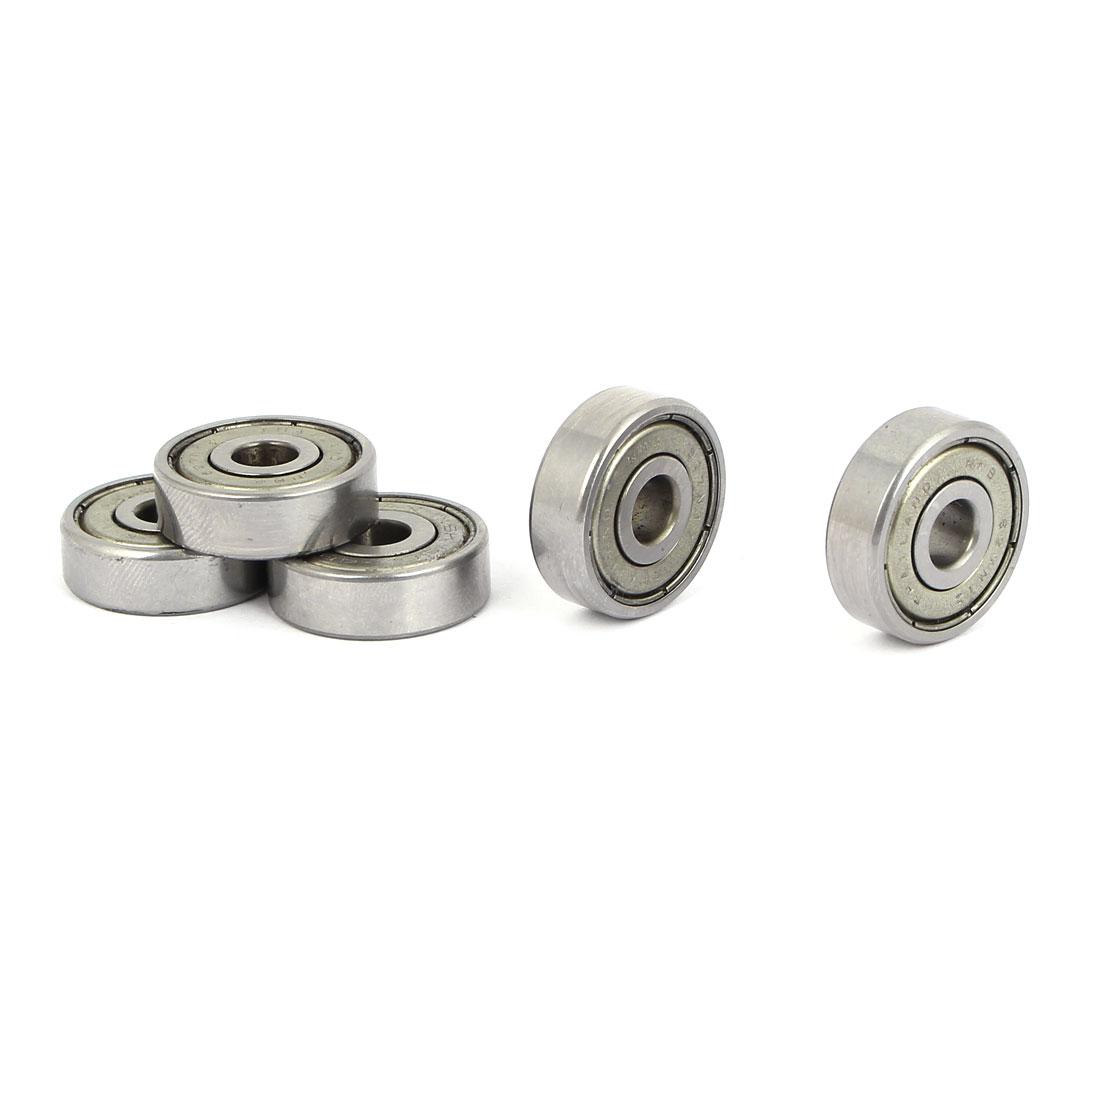 6mm x 22mm x 7mm Steel Sealed Single Row Deep Groove Ball Wheel Bearings 5PCS